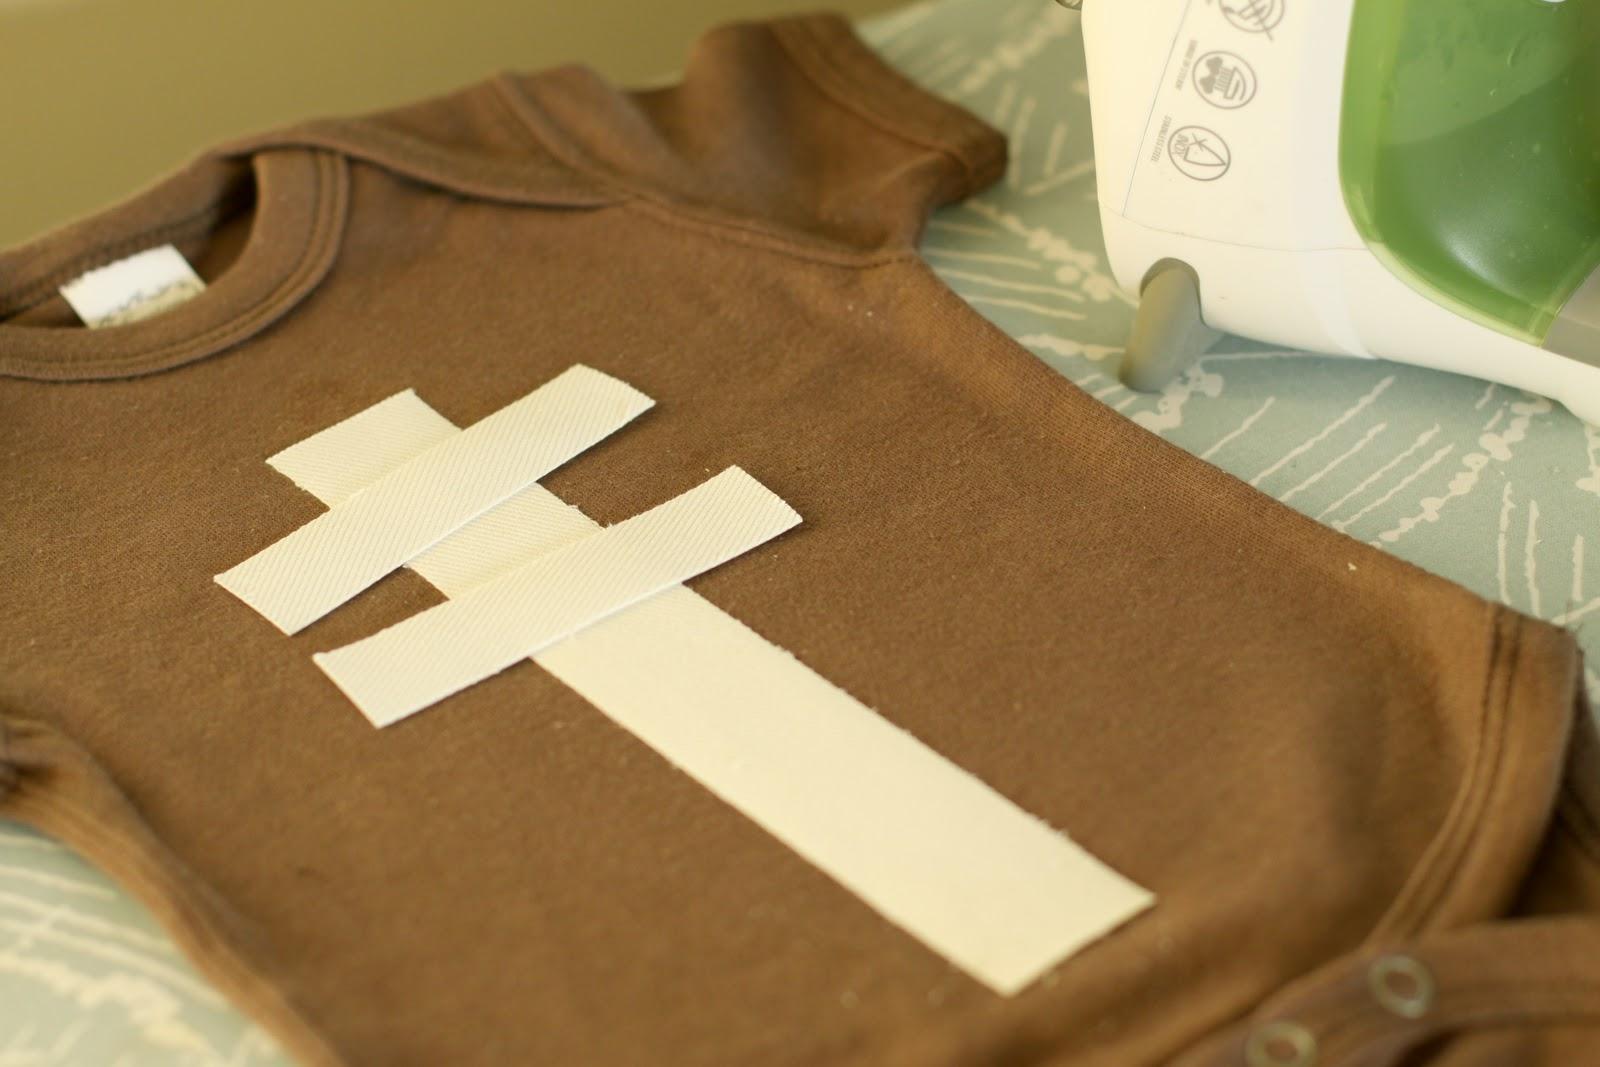 2. Cut strips and arrange on onesie. a933662dd